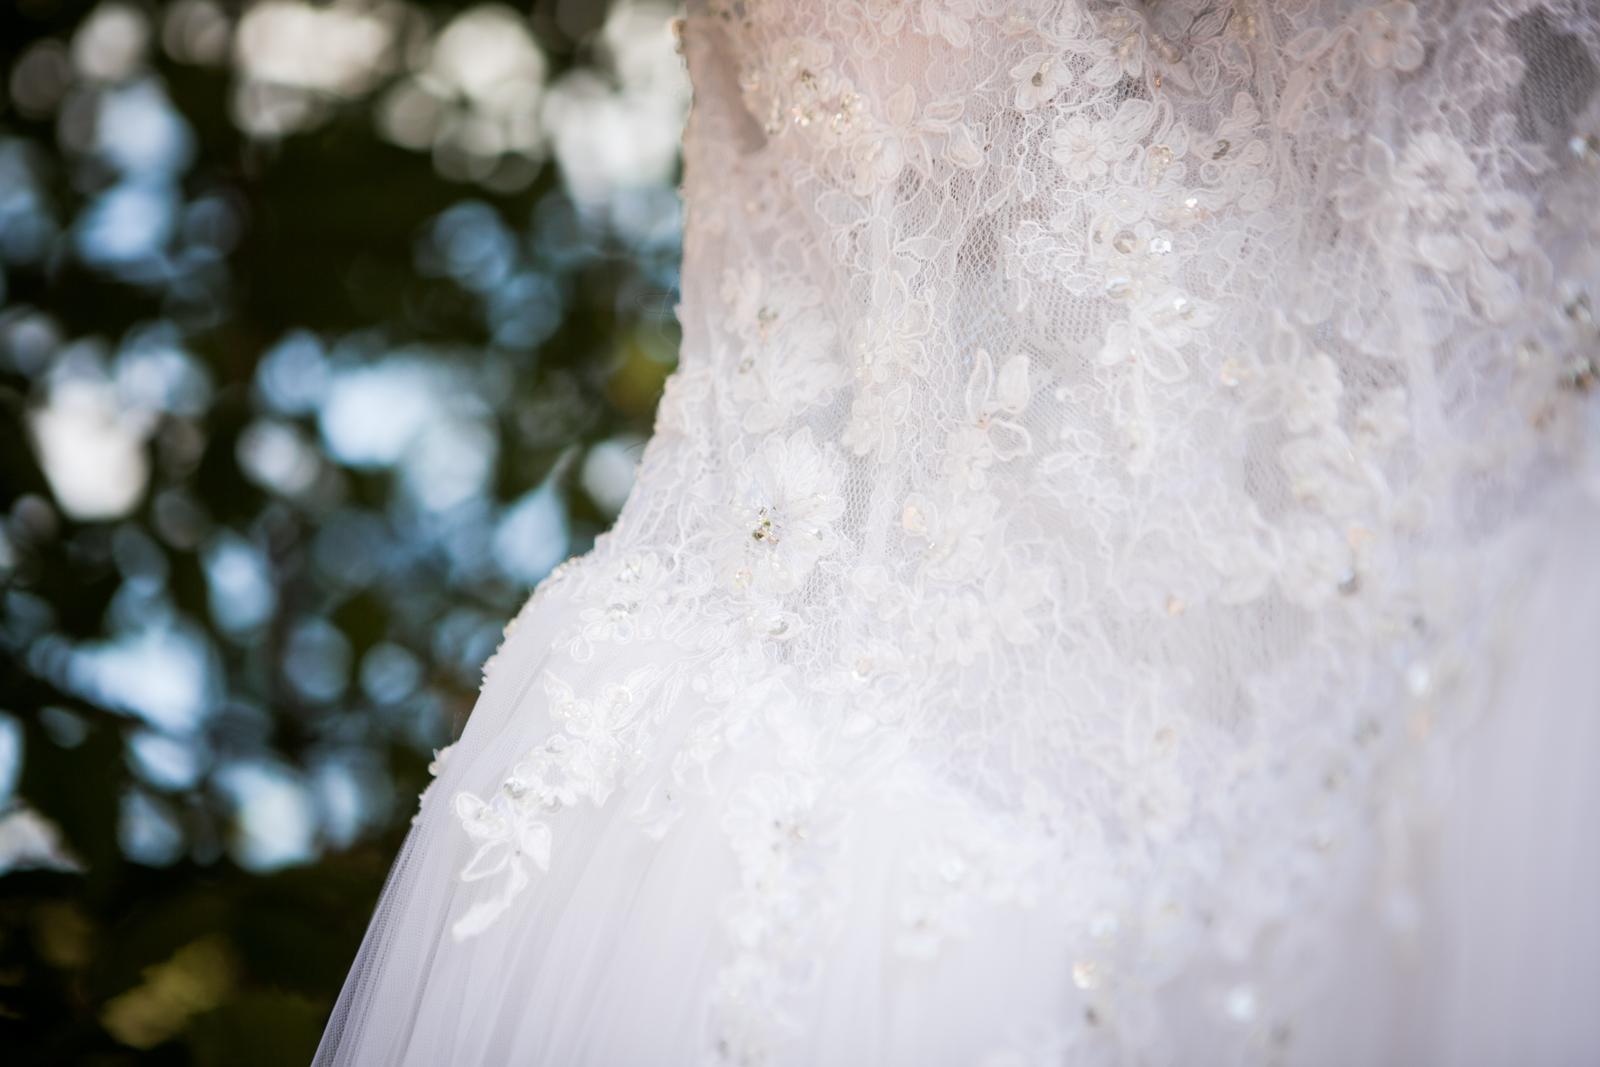 Svatební šaty Igar Euphoria - Obrázek č. 4